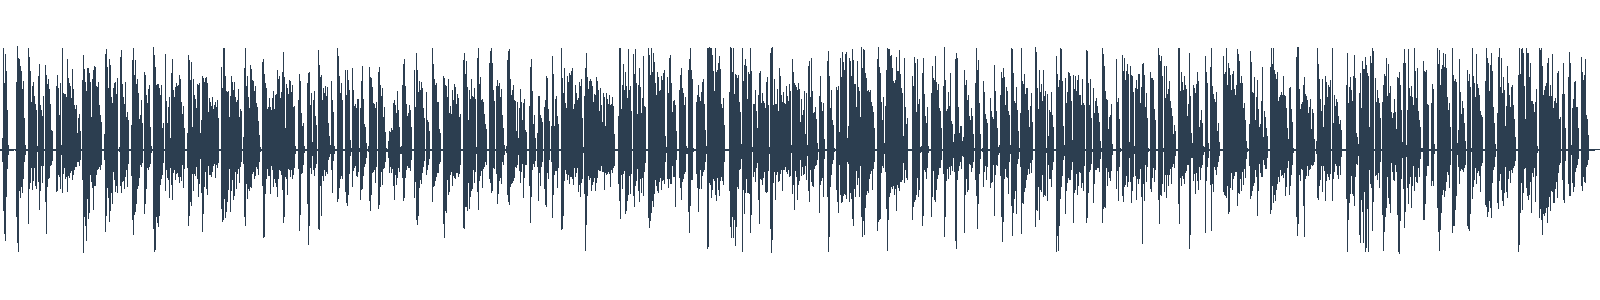 Dominik Dán - Nežná fatamorgána waveform